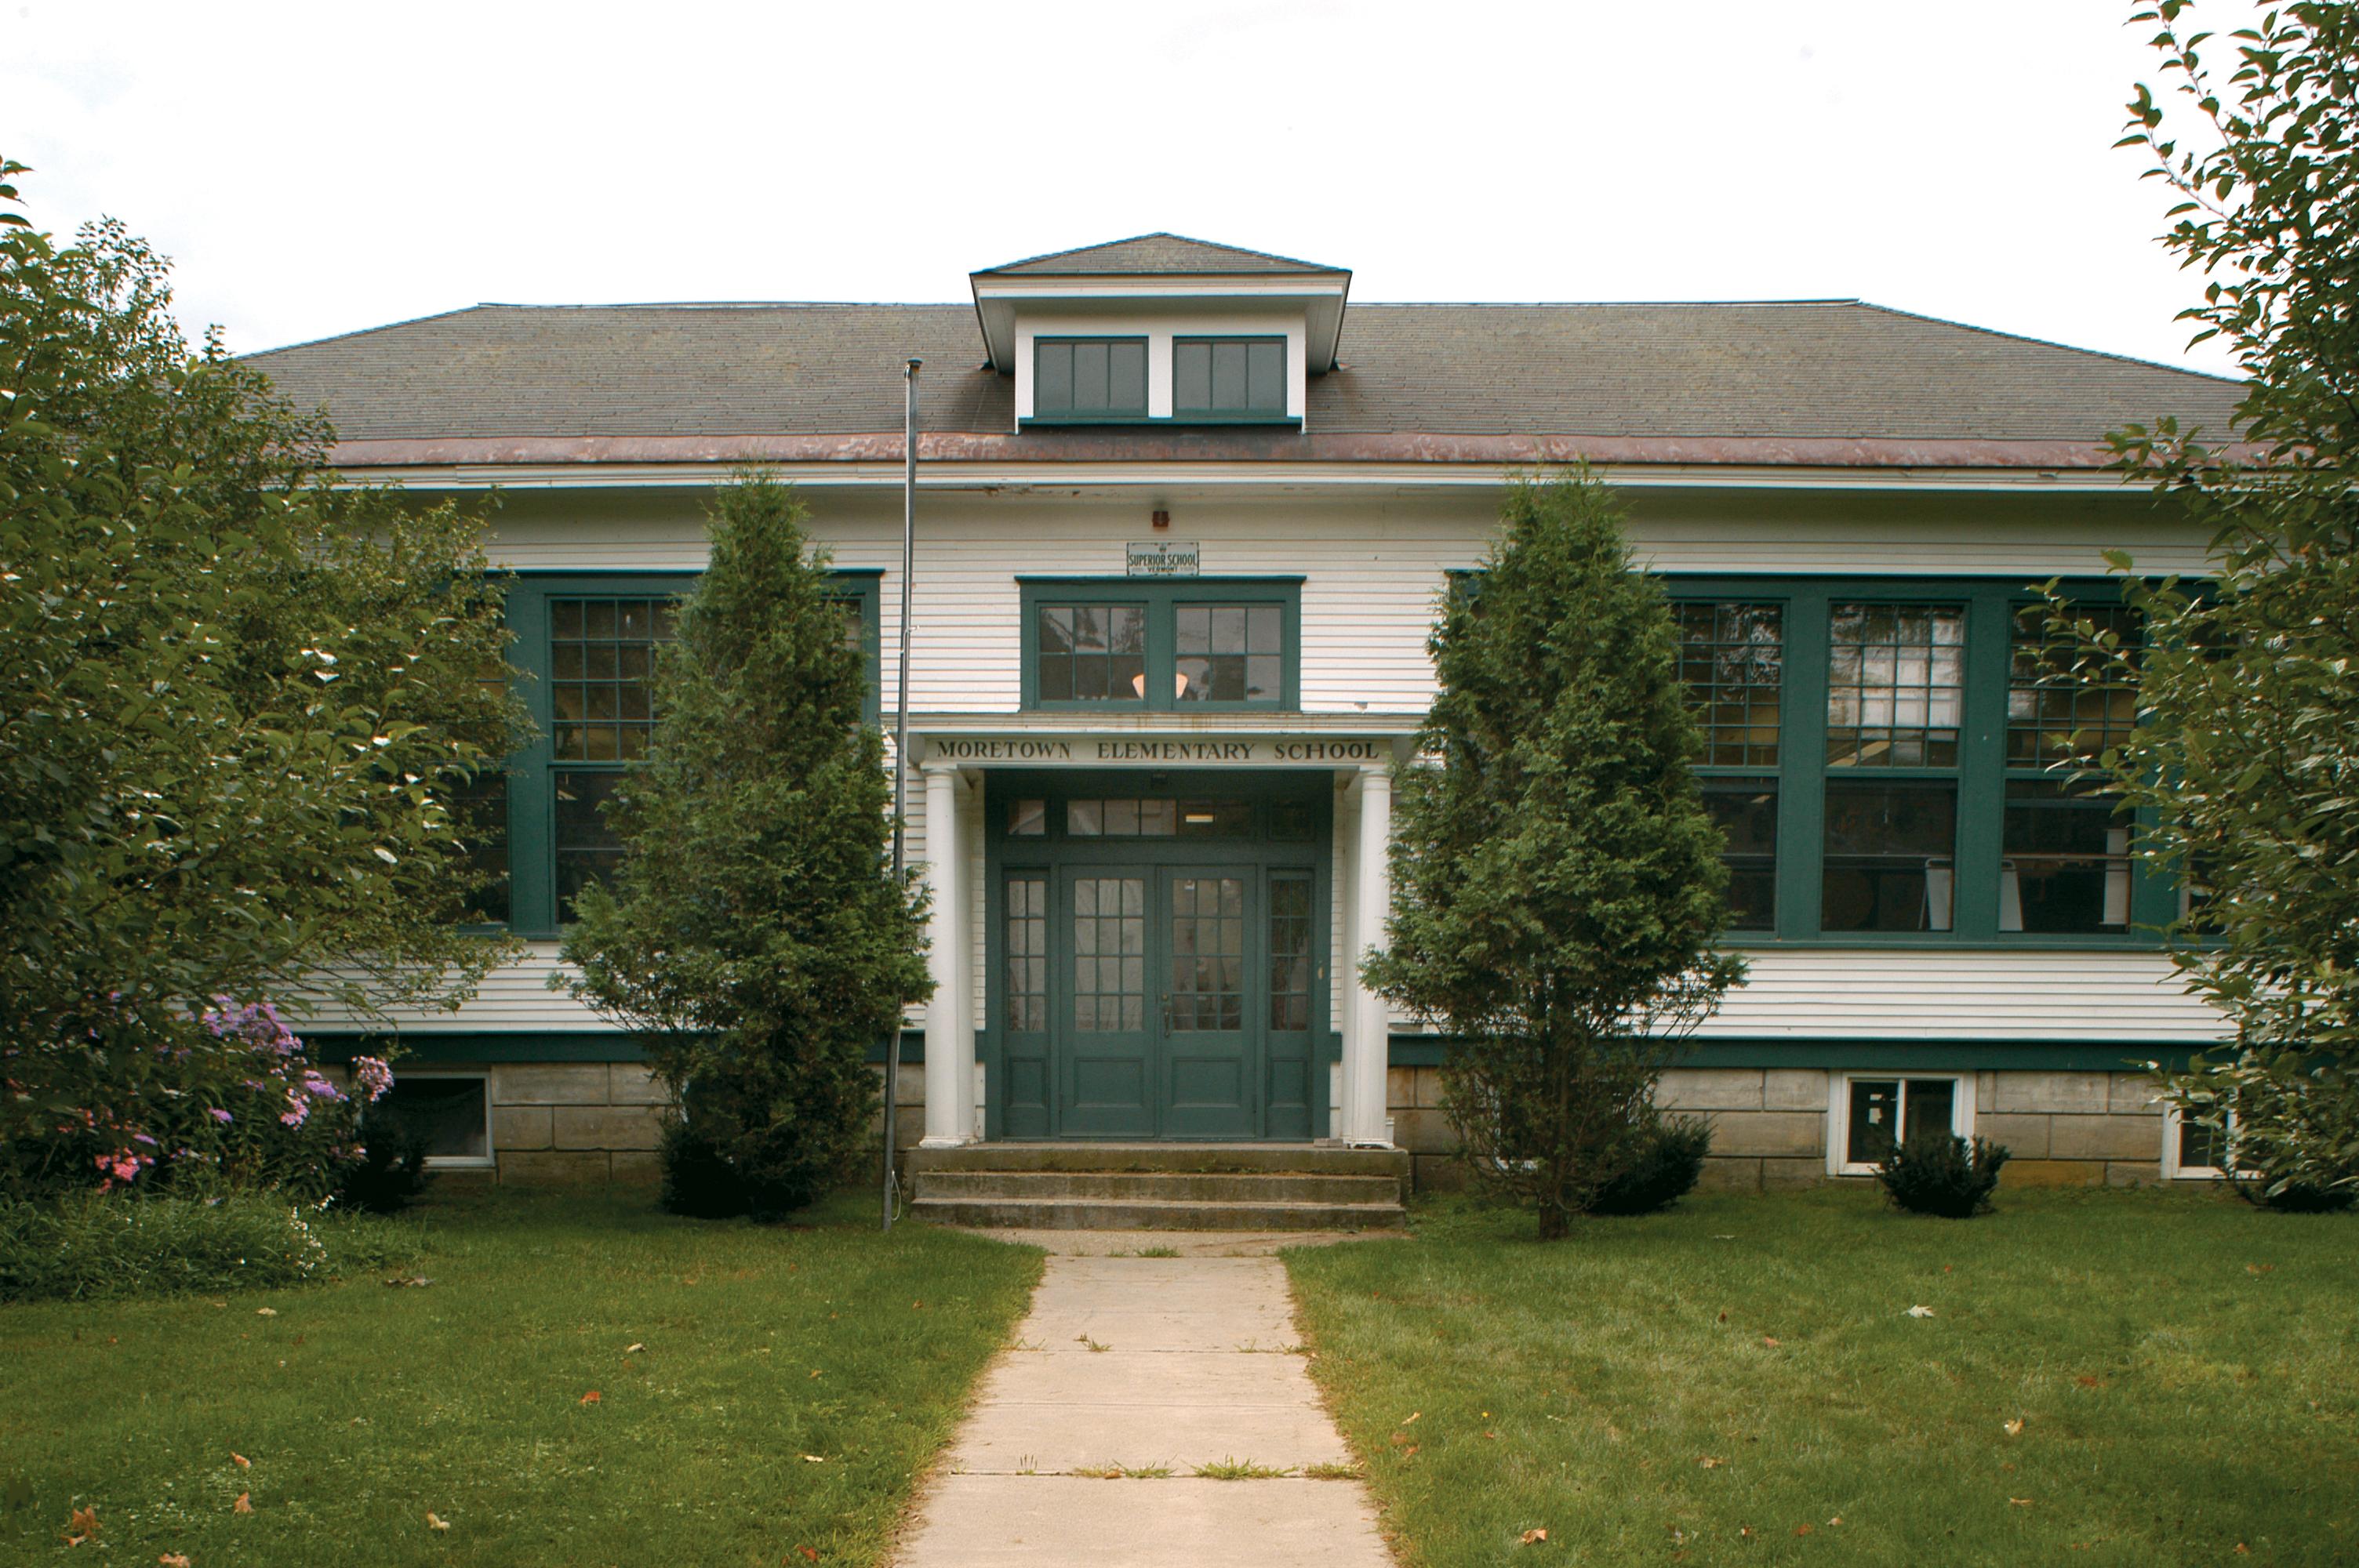 Moretown Elementary School